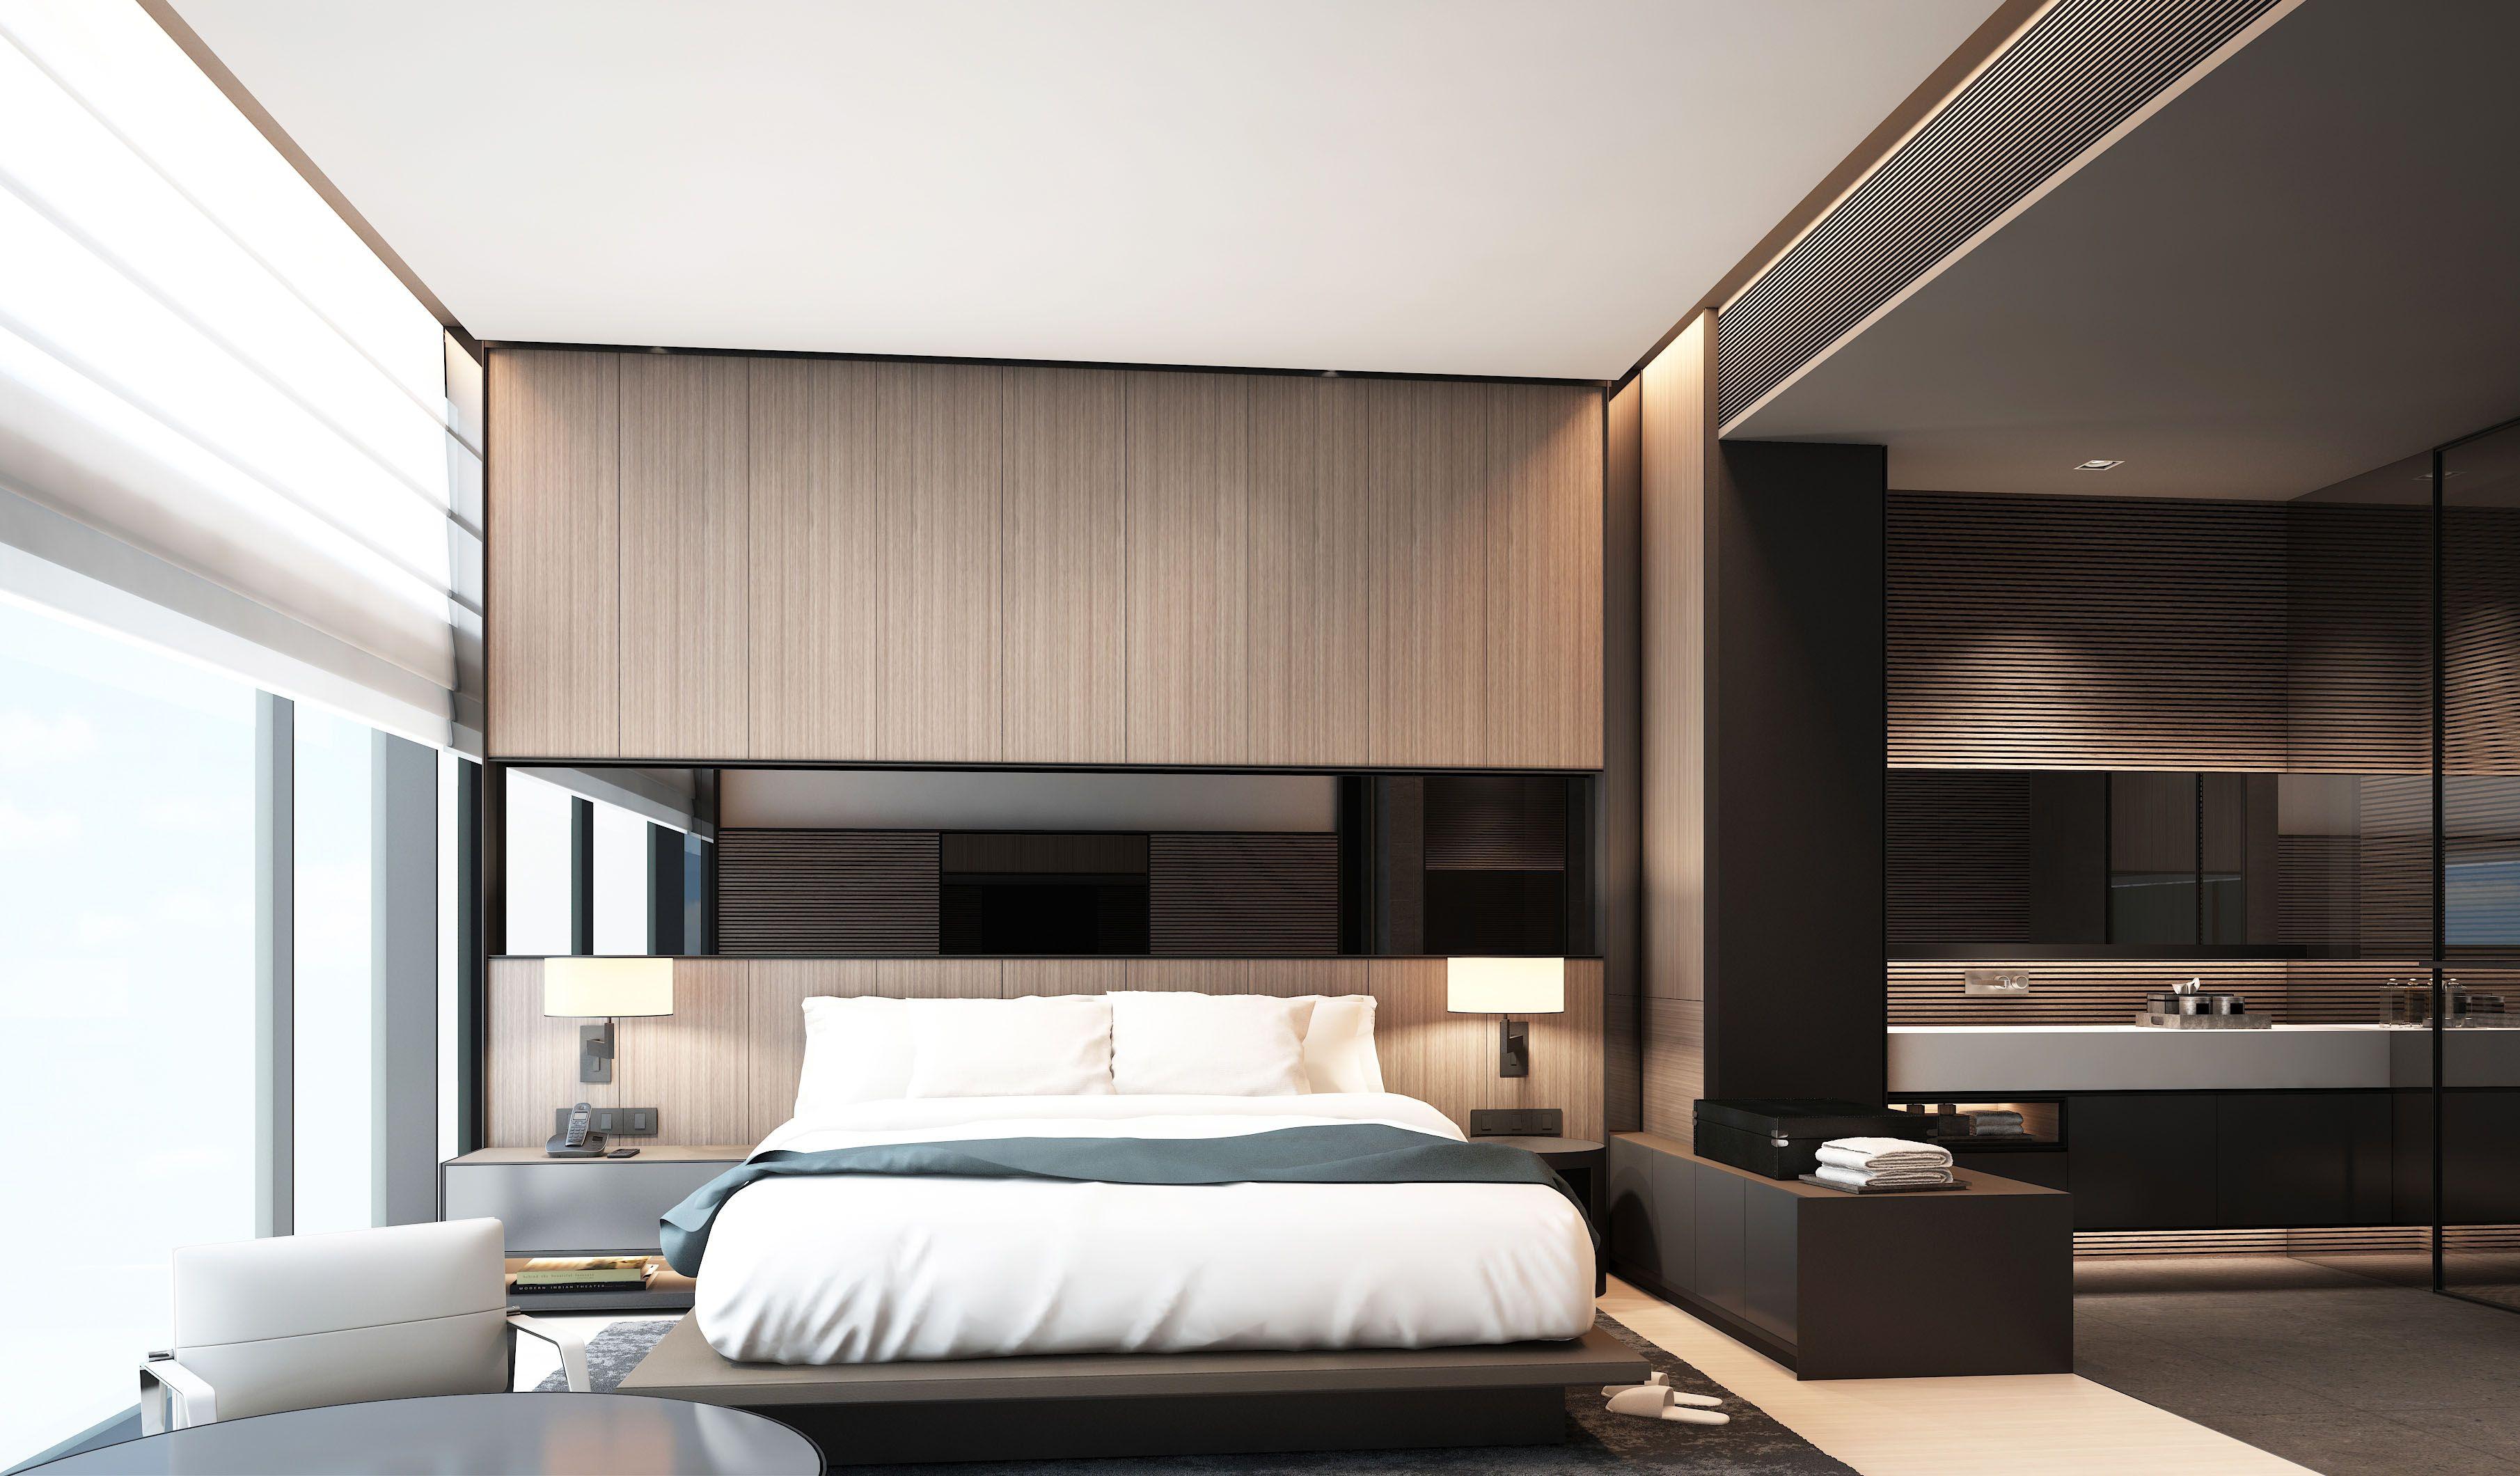 Znalezione obrazy dla zapytania silver fox design for Schlafzimmer interior design